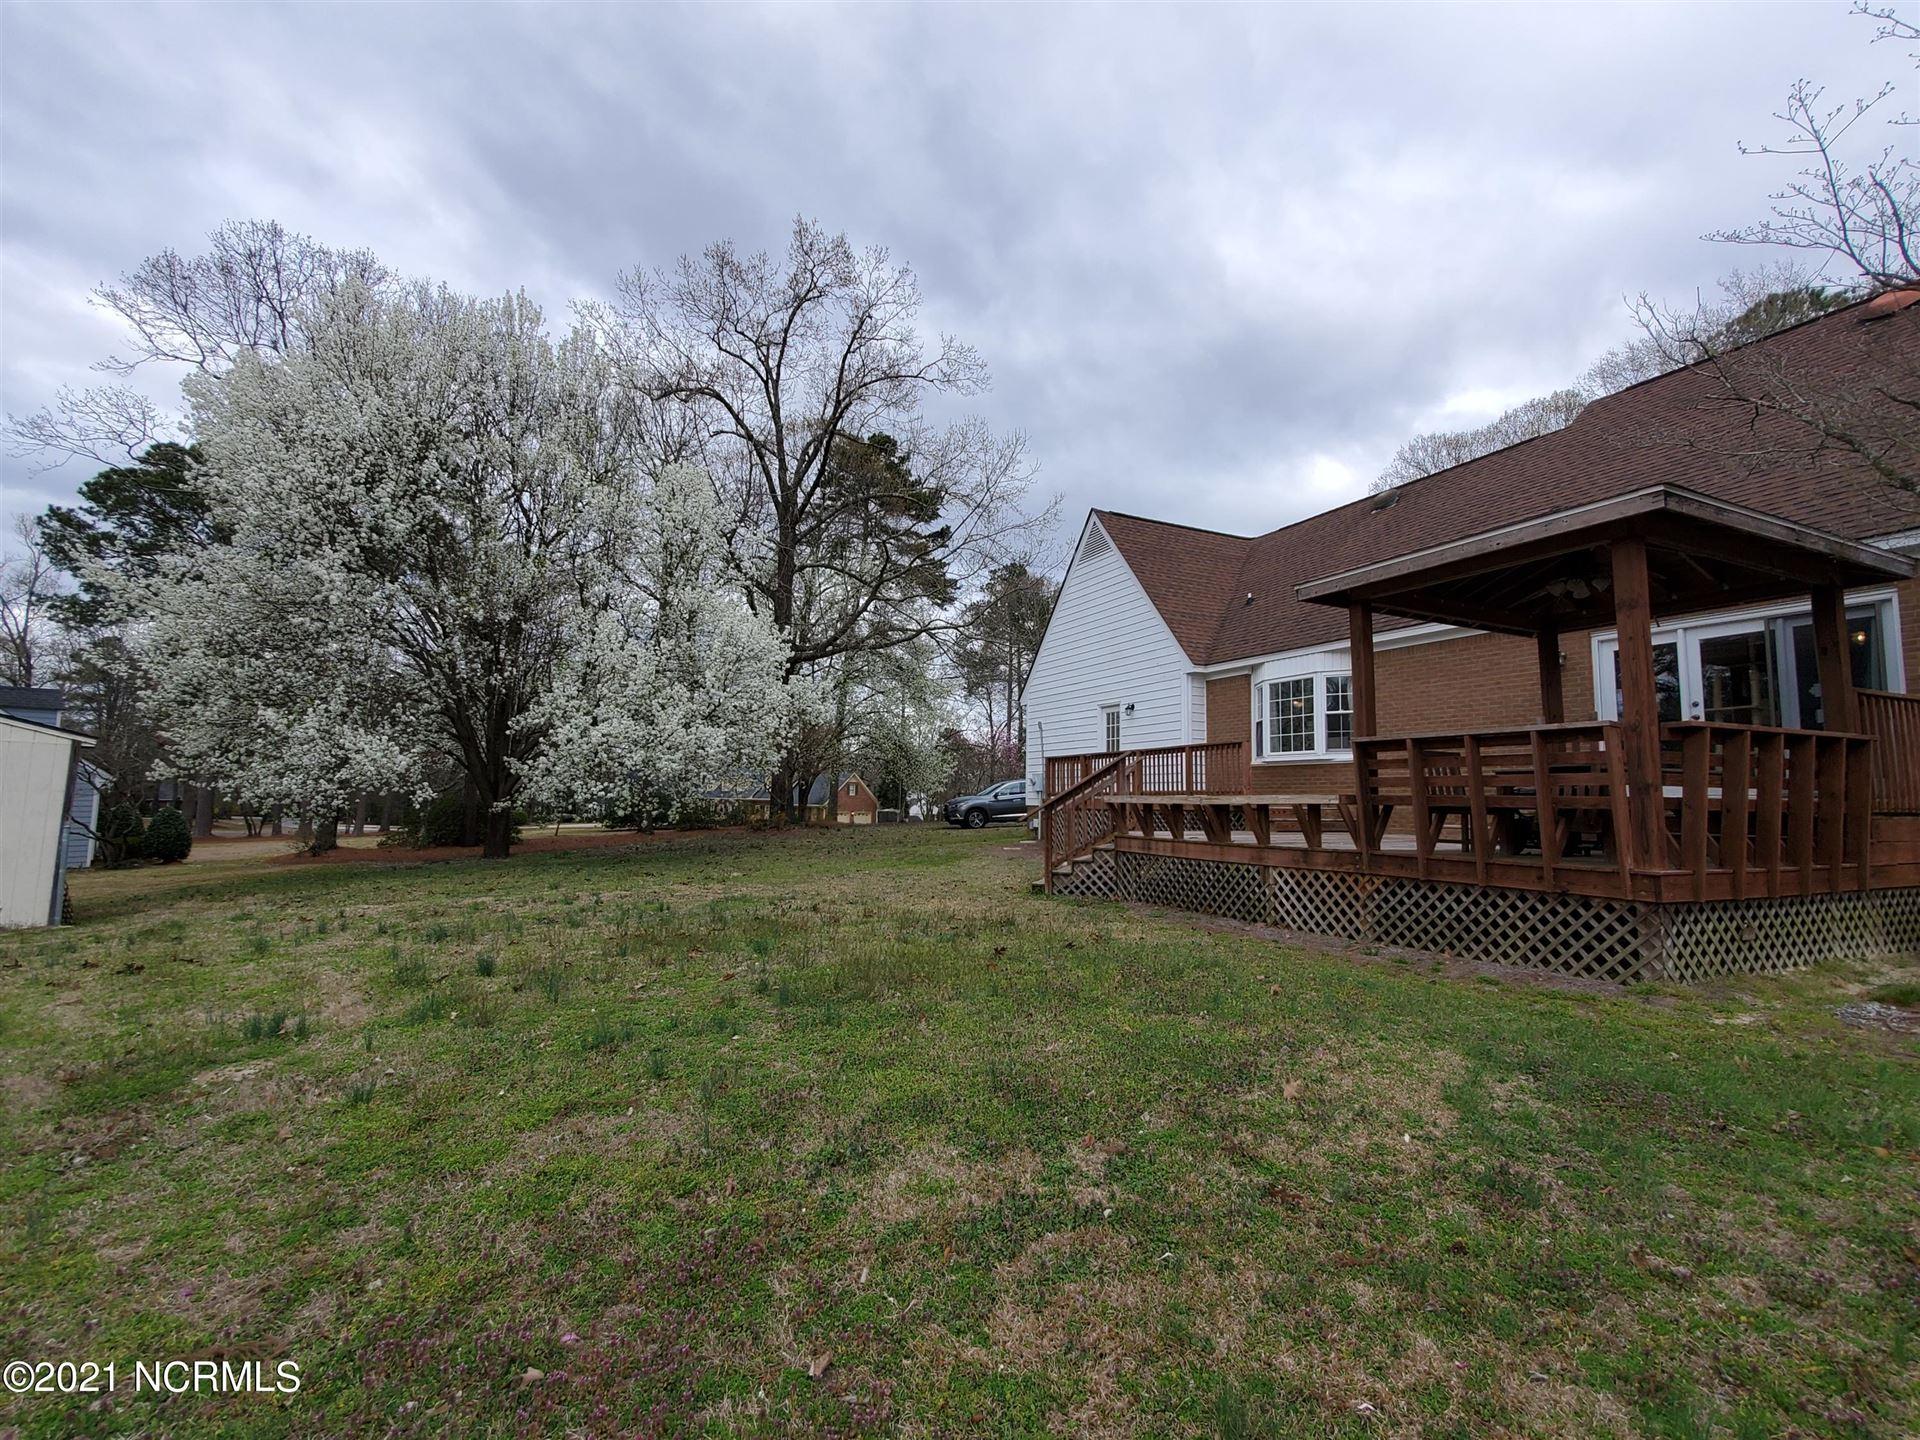 Photo of 101 W Arrowhead Drive, Clinton, NC 28328 (MLS # 100262986)